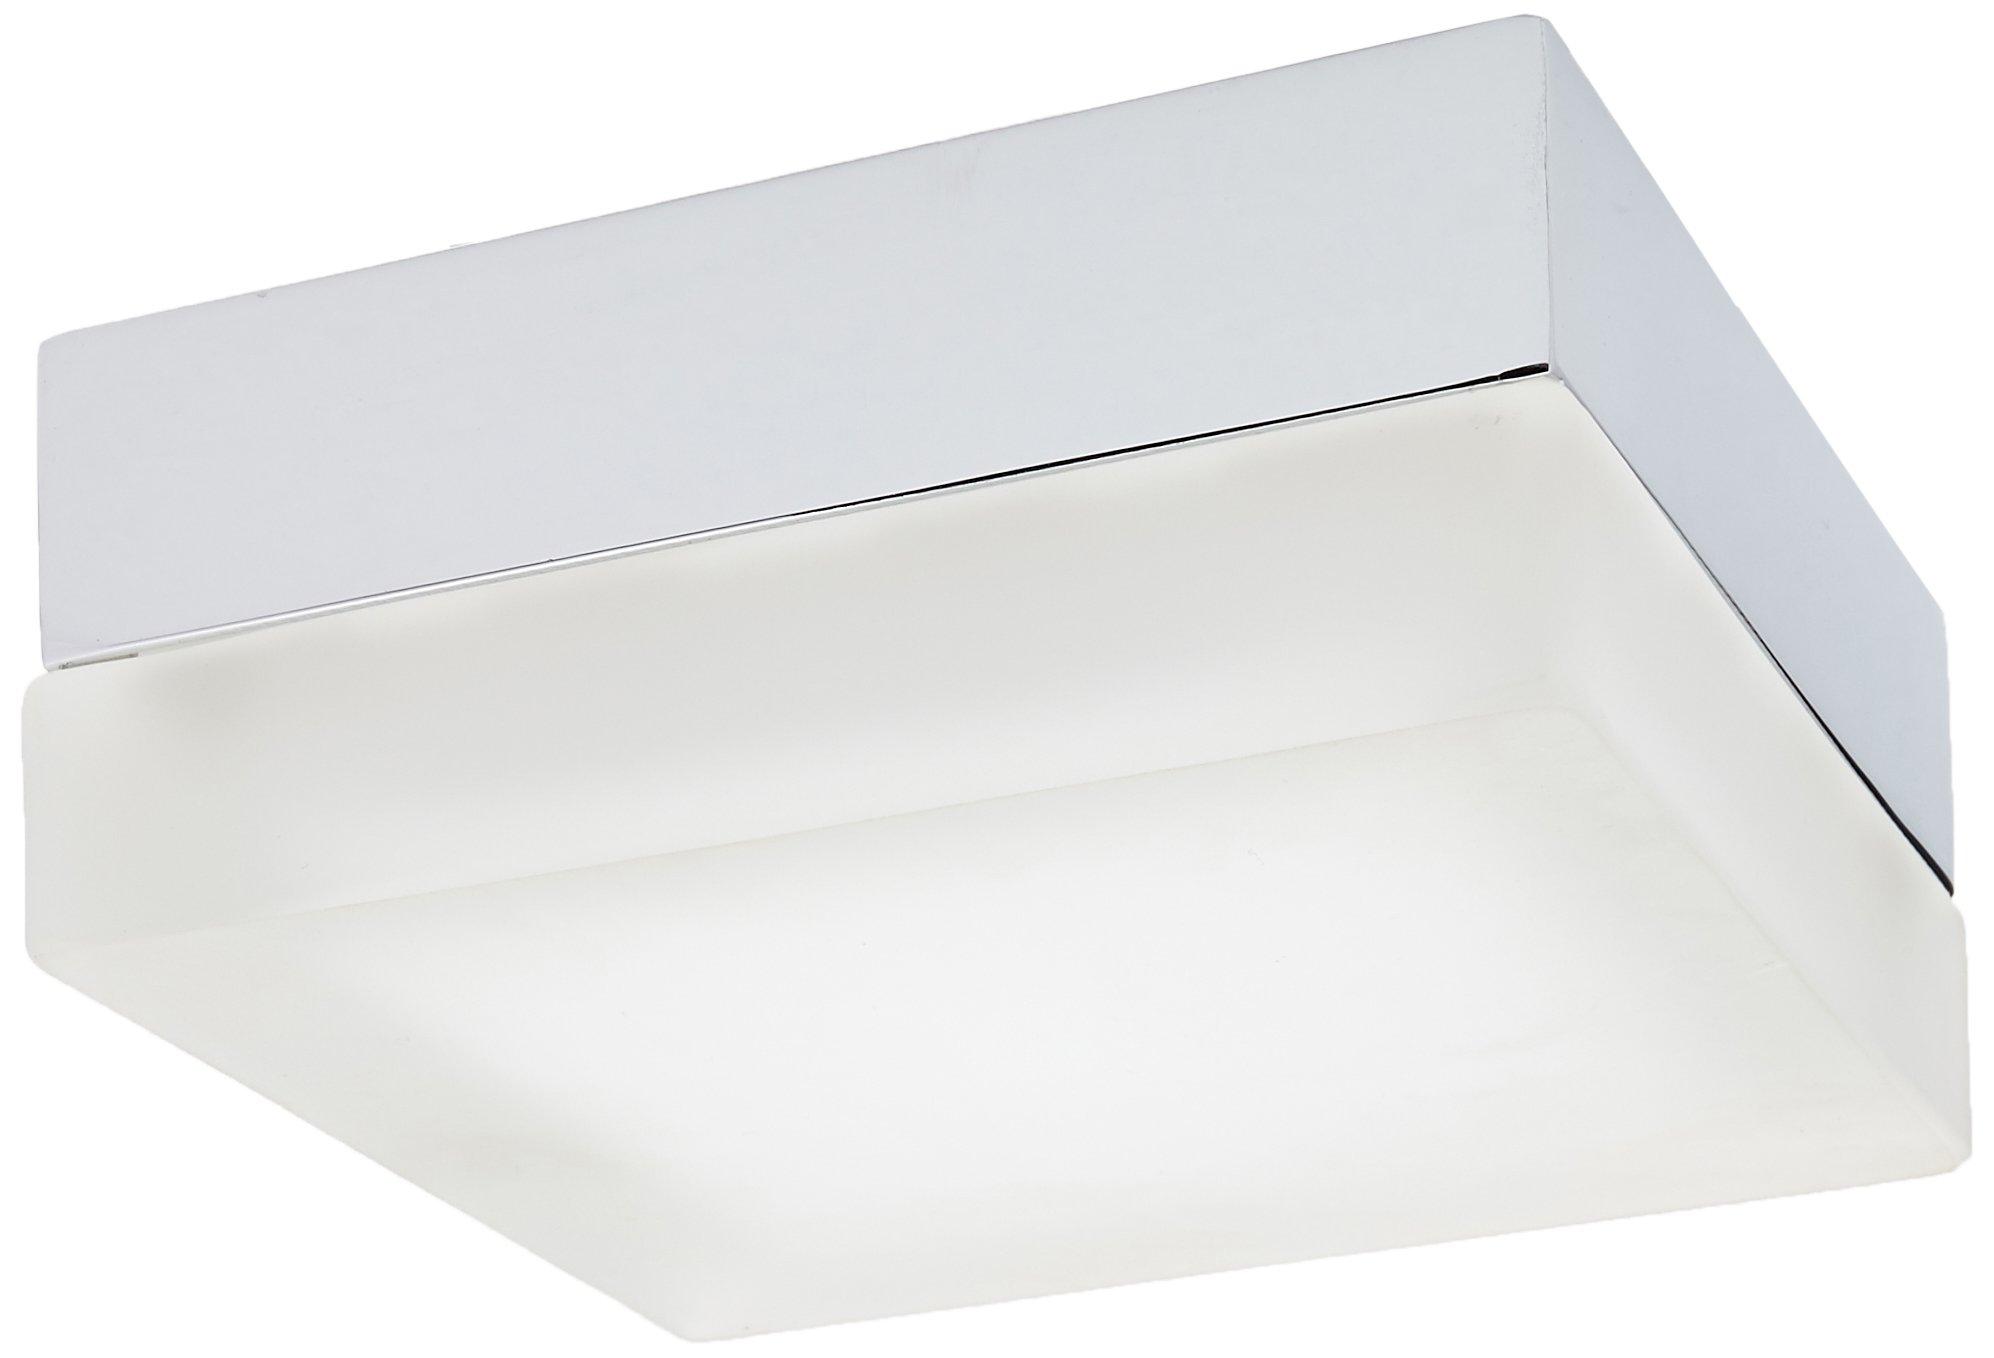 WAC Lighting FM-4006-30-CH 6in Square Soft White